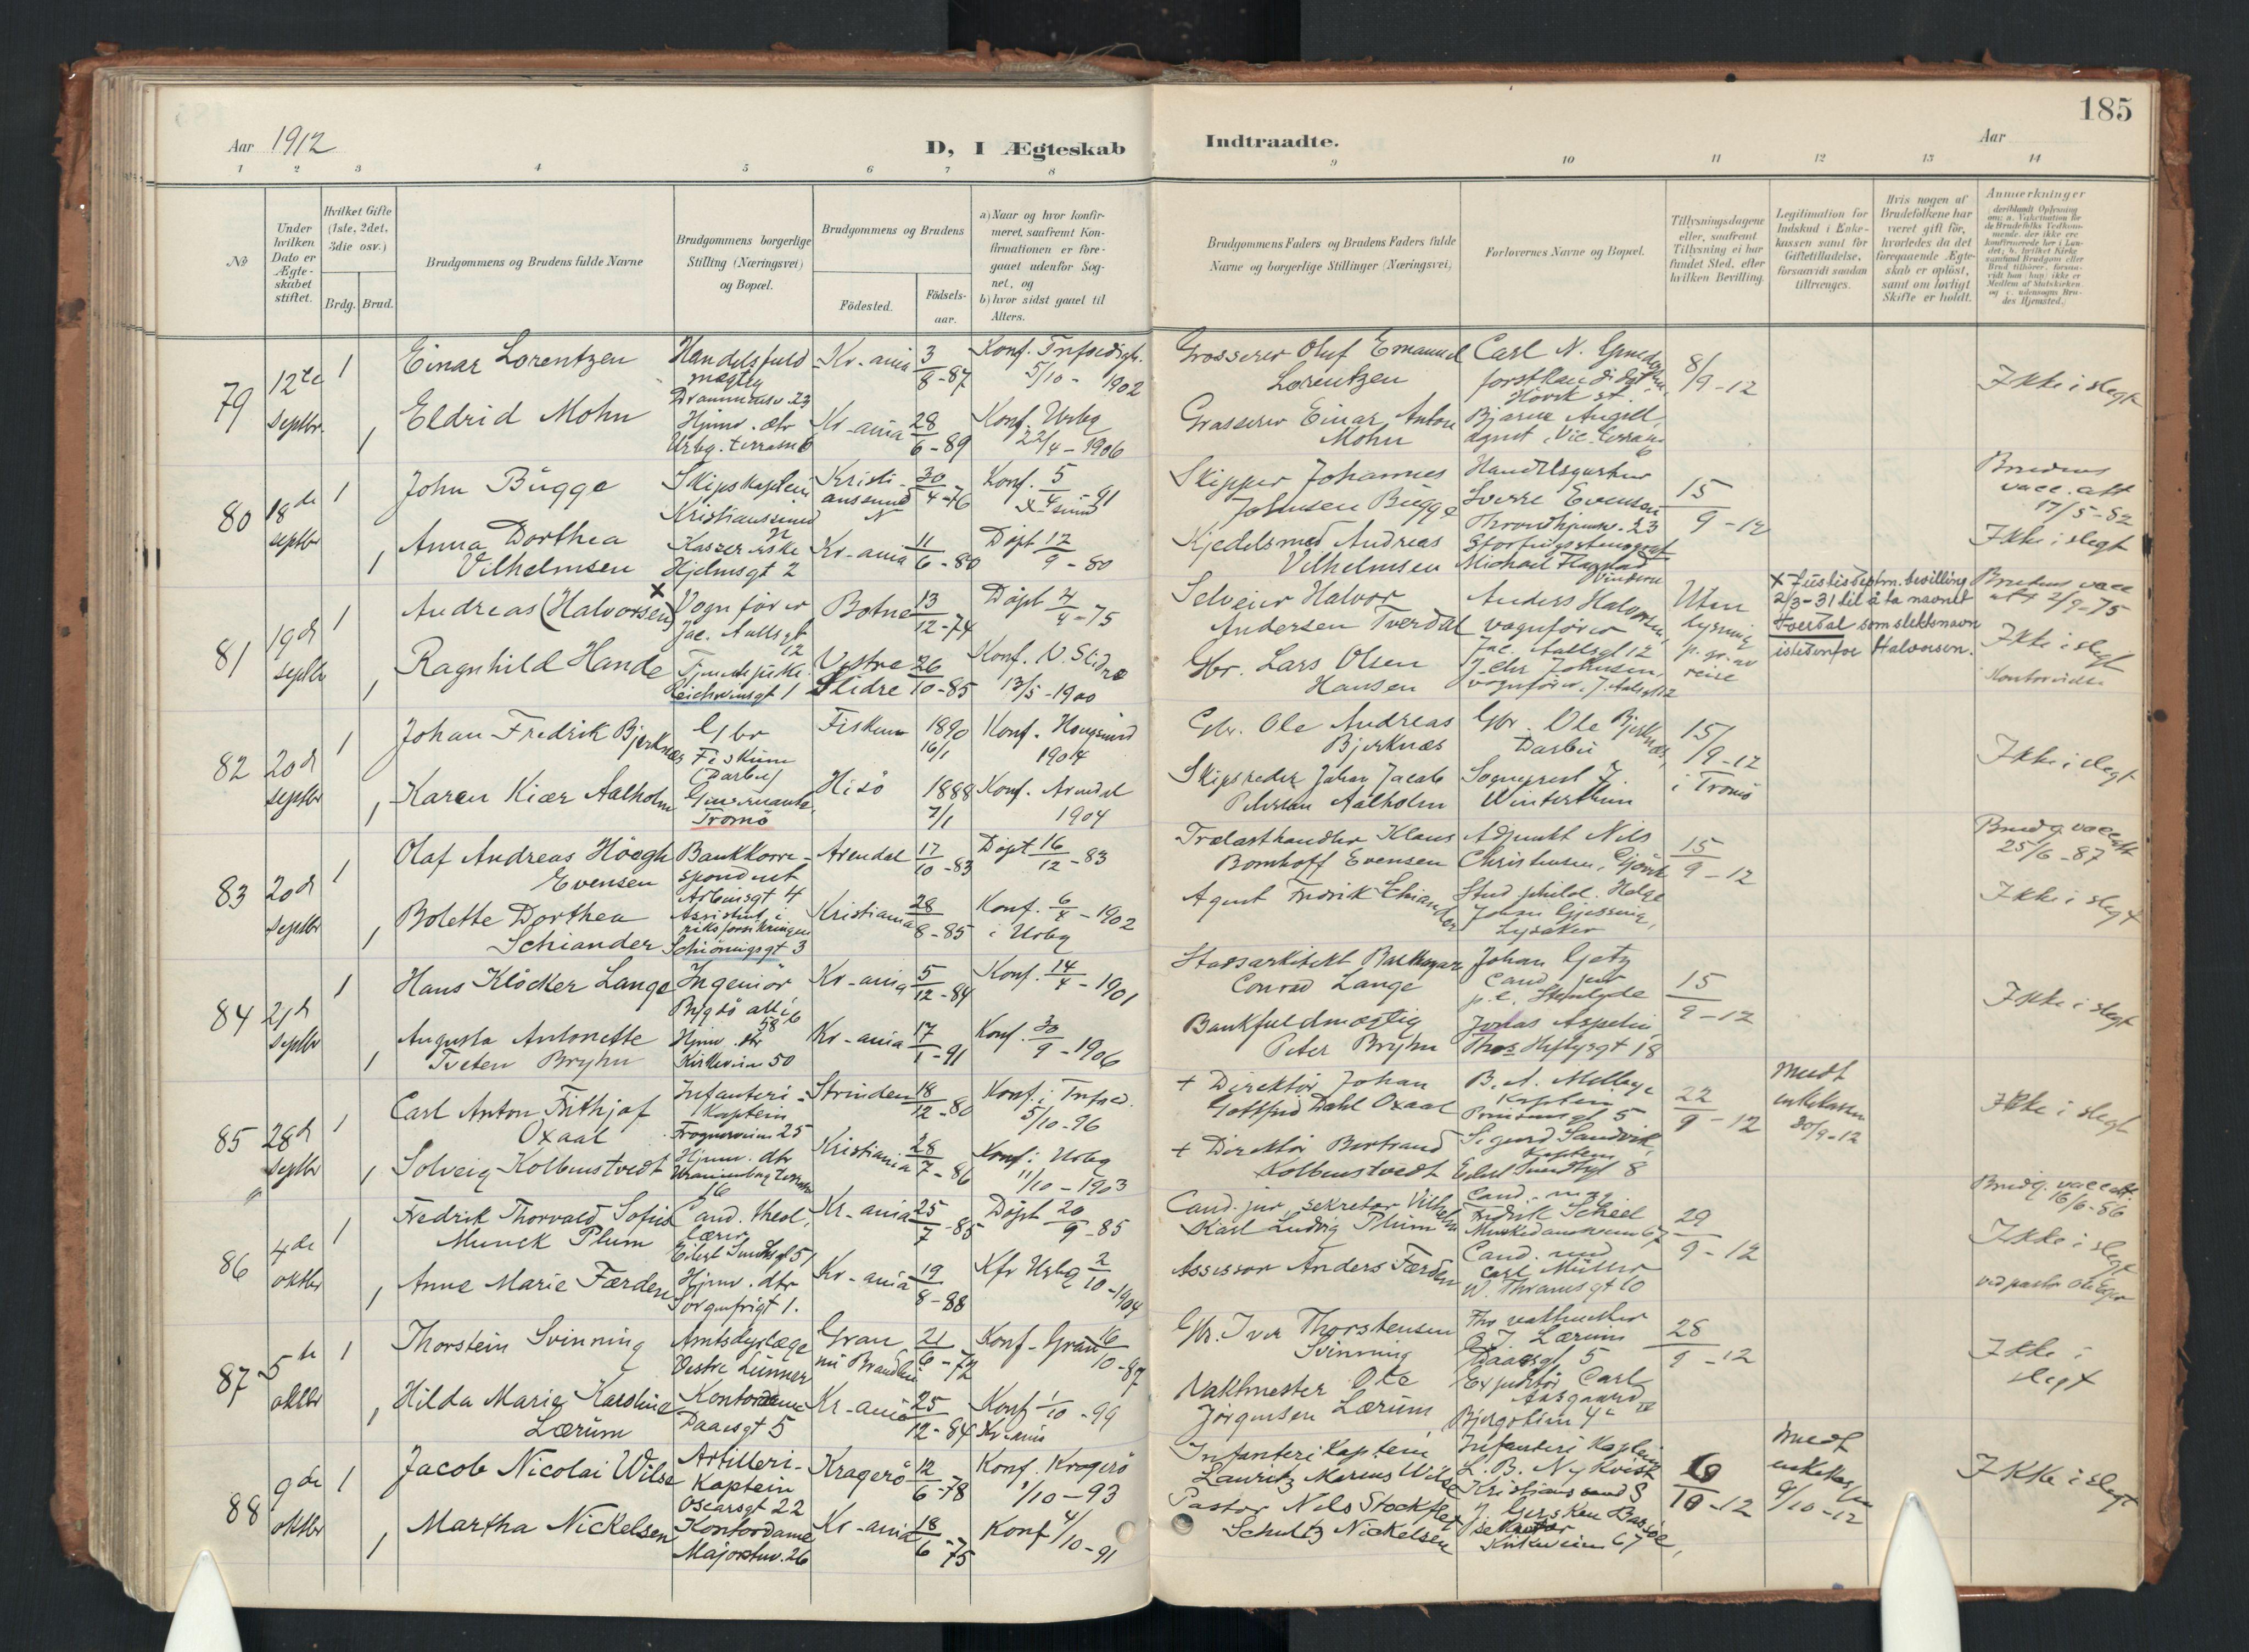 SAO, Uranienborg prestekontor Kirkebøker, F/Fa/L0007: Ministerialbok nr. 7, 1896-1914, s. 185